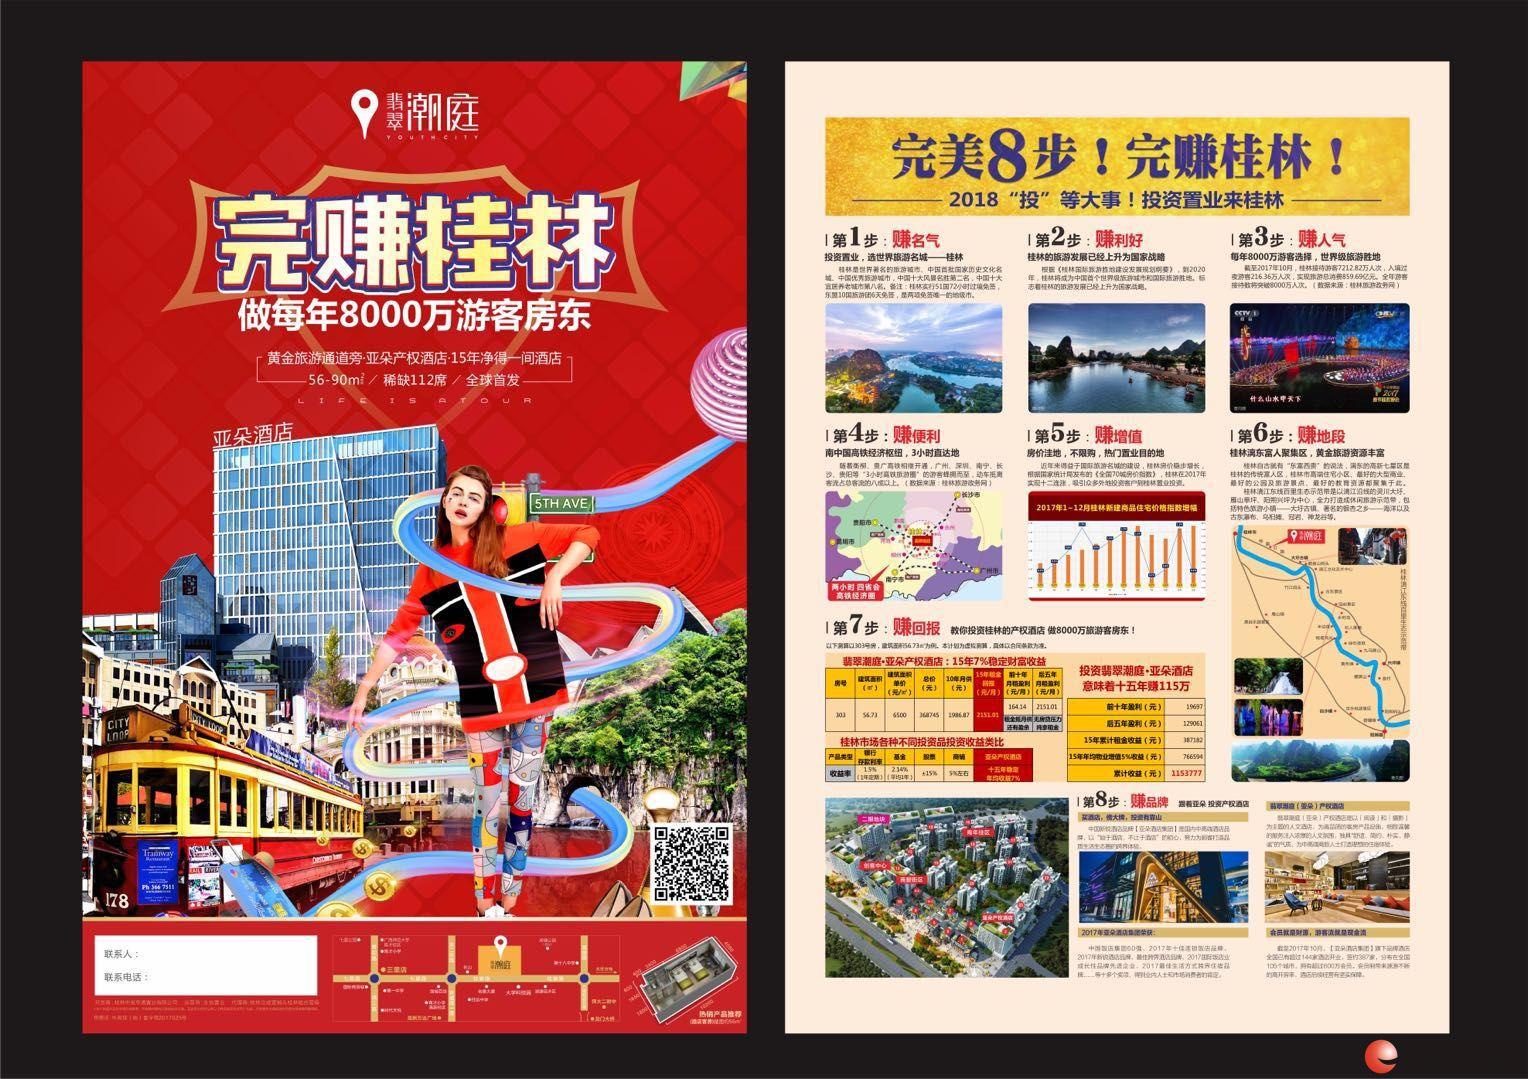 tt七星区 桂磨路 翡翠·潮庭 上海亚朵酒店公寓强势来袭 做8000万游客的房东!